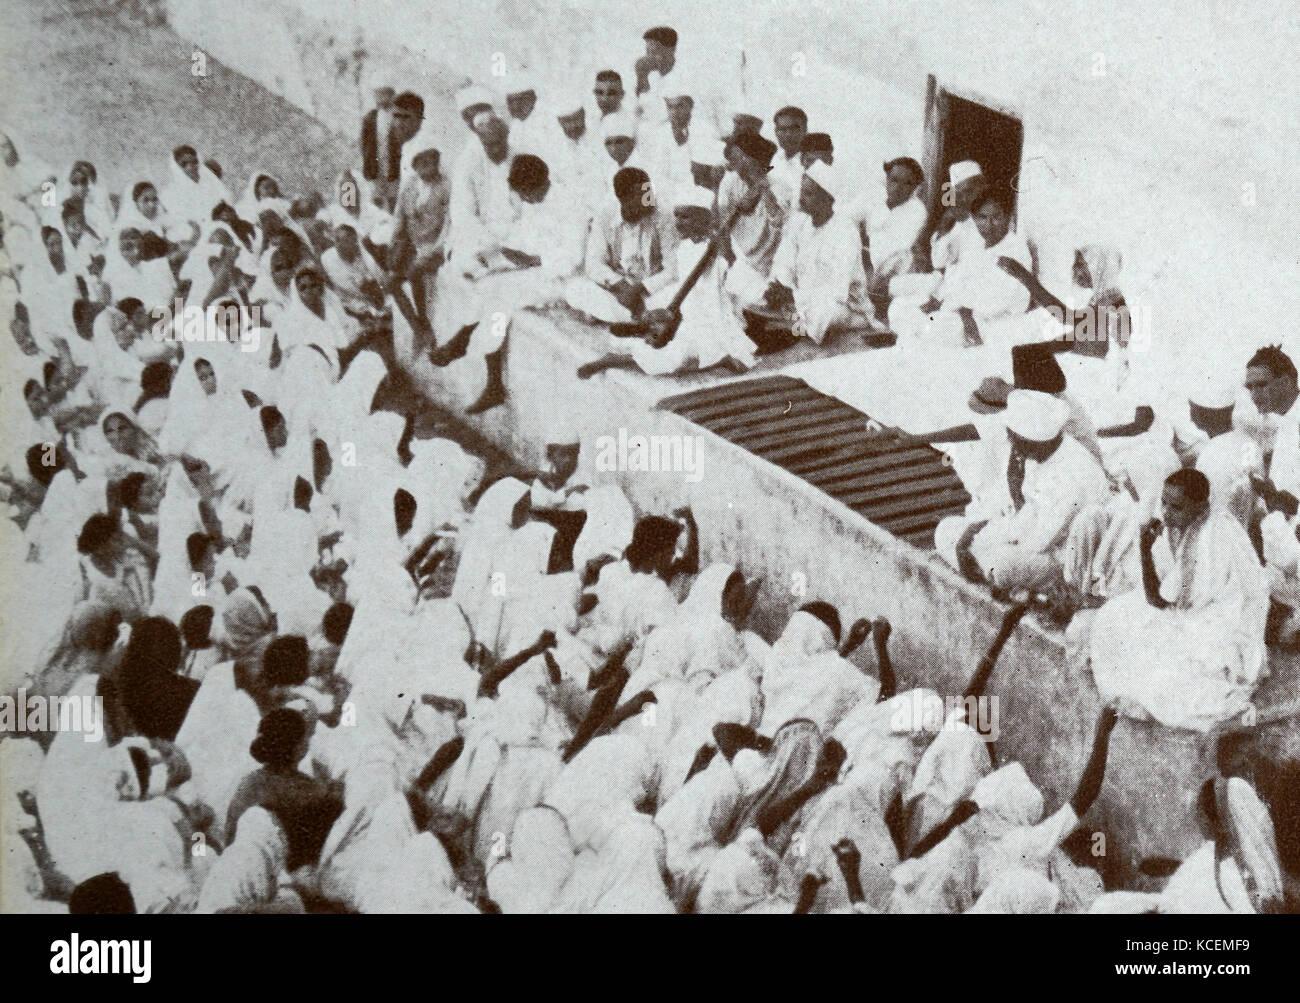 Short essay on the Dandi March (Yatra) led by Mahatma Gandhi